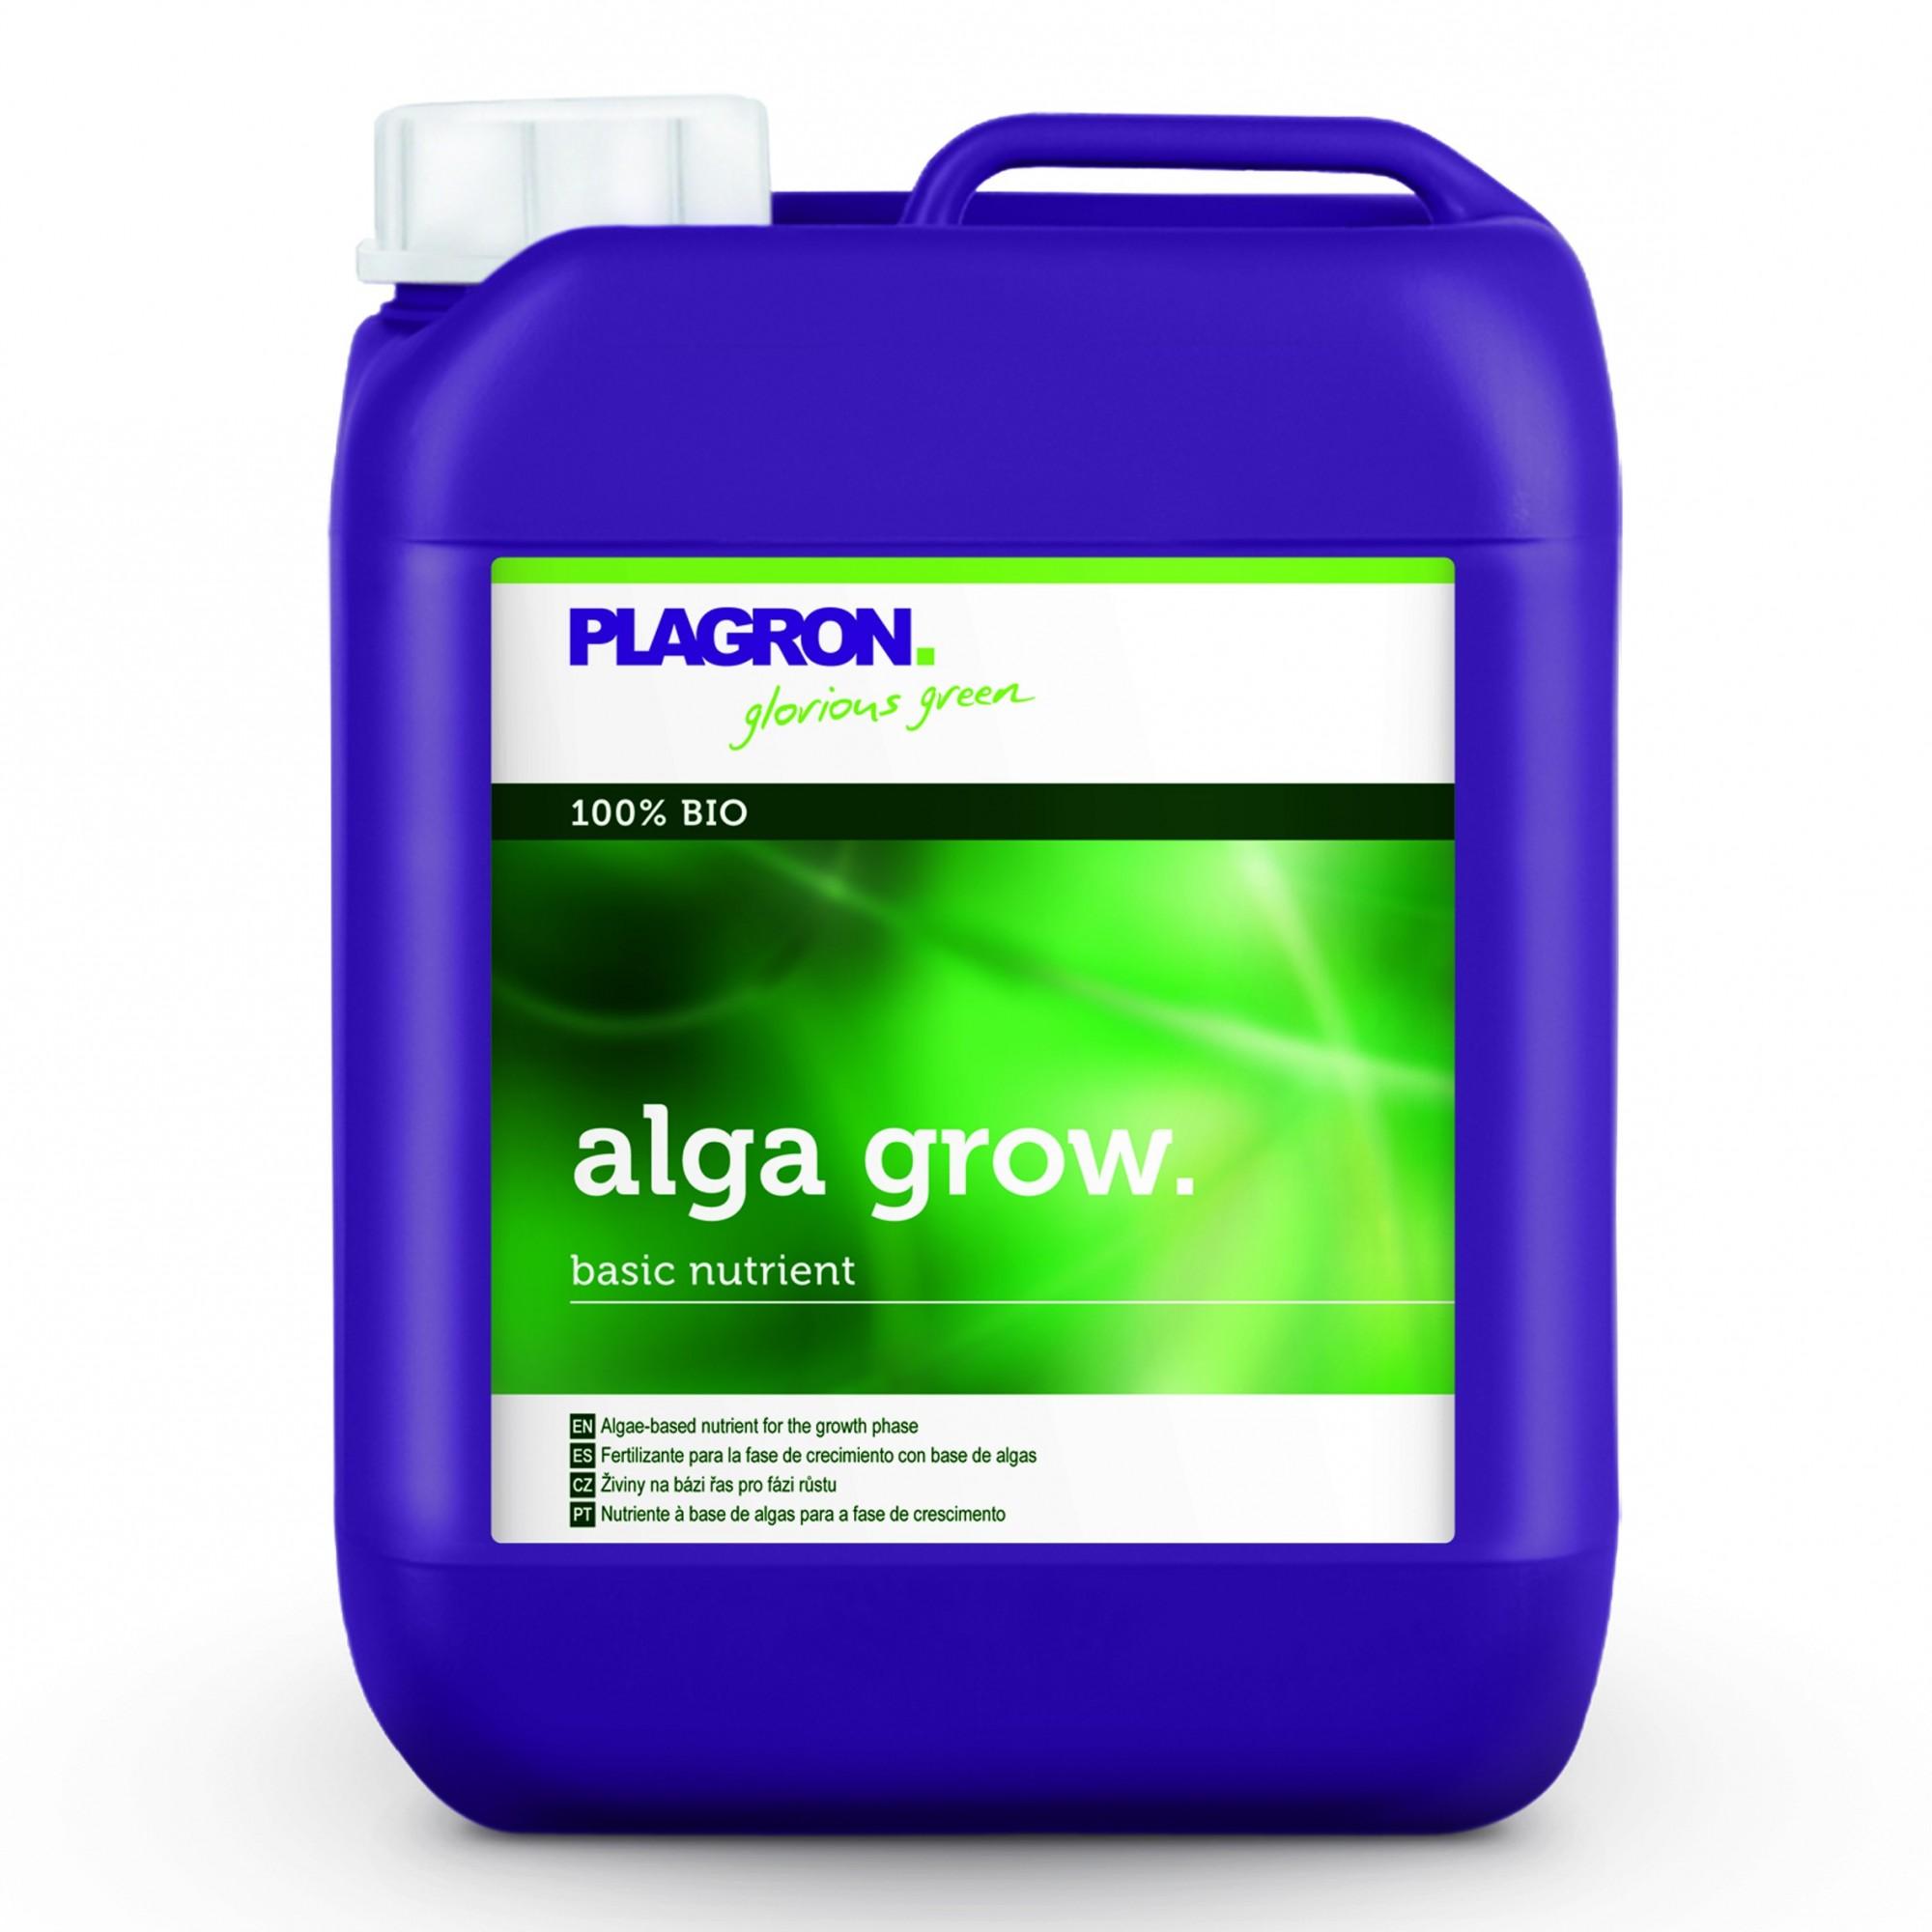 Plagron Alga Grow 5 l - růstové hnojivo